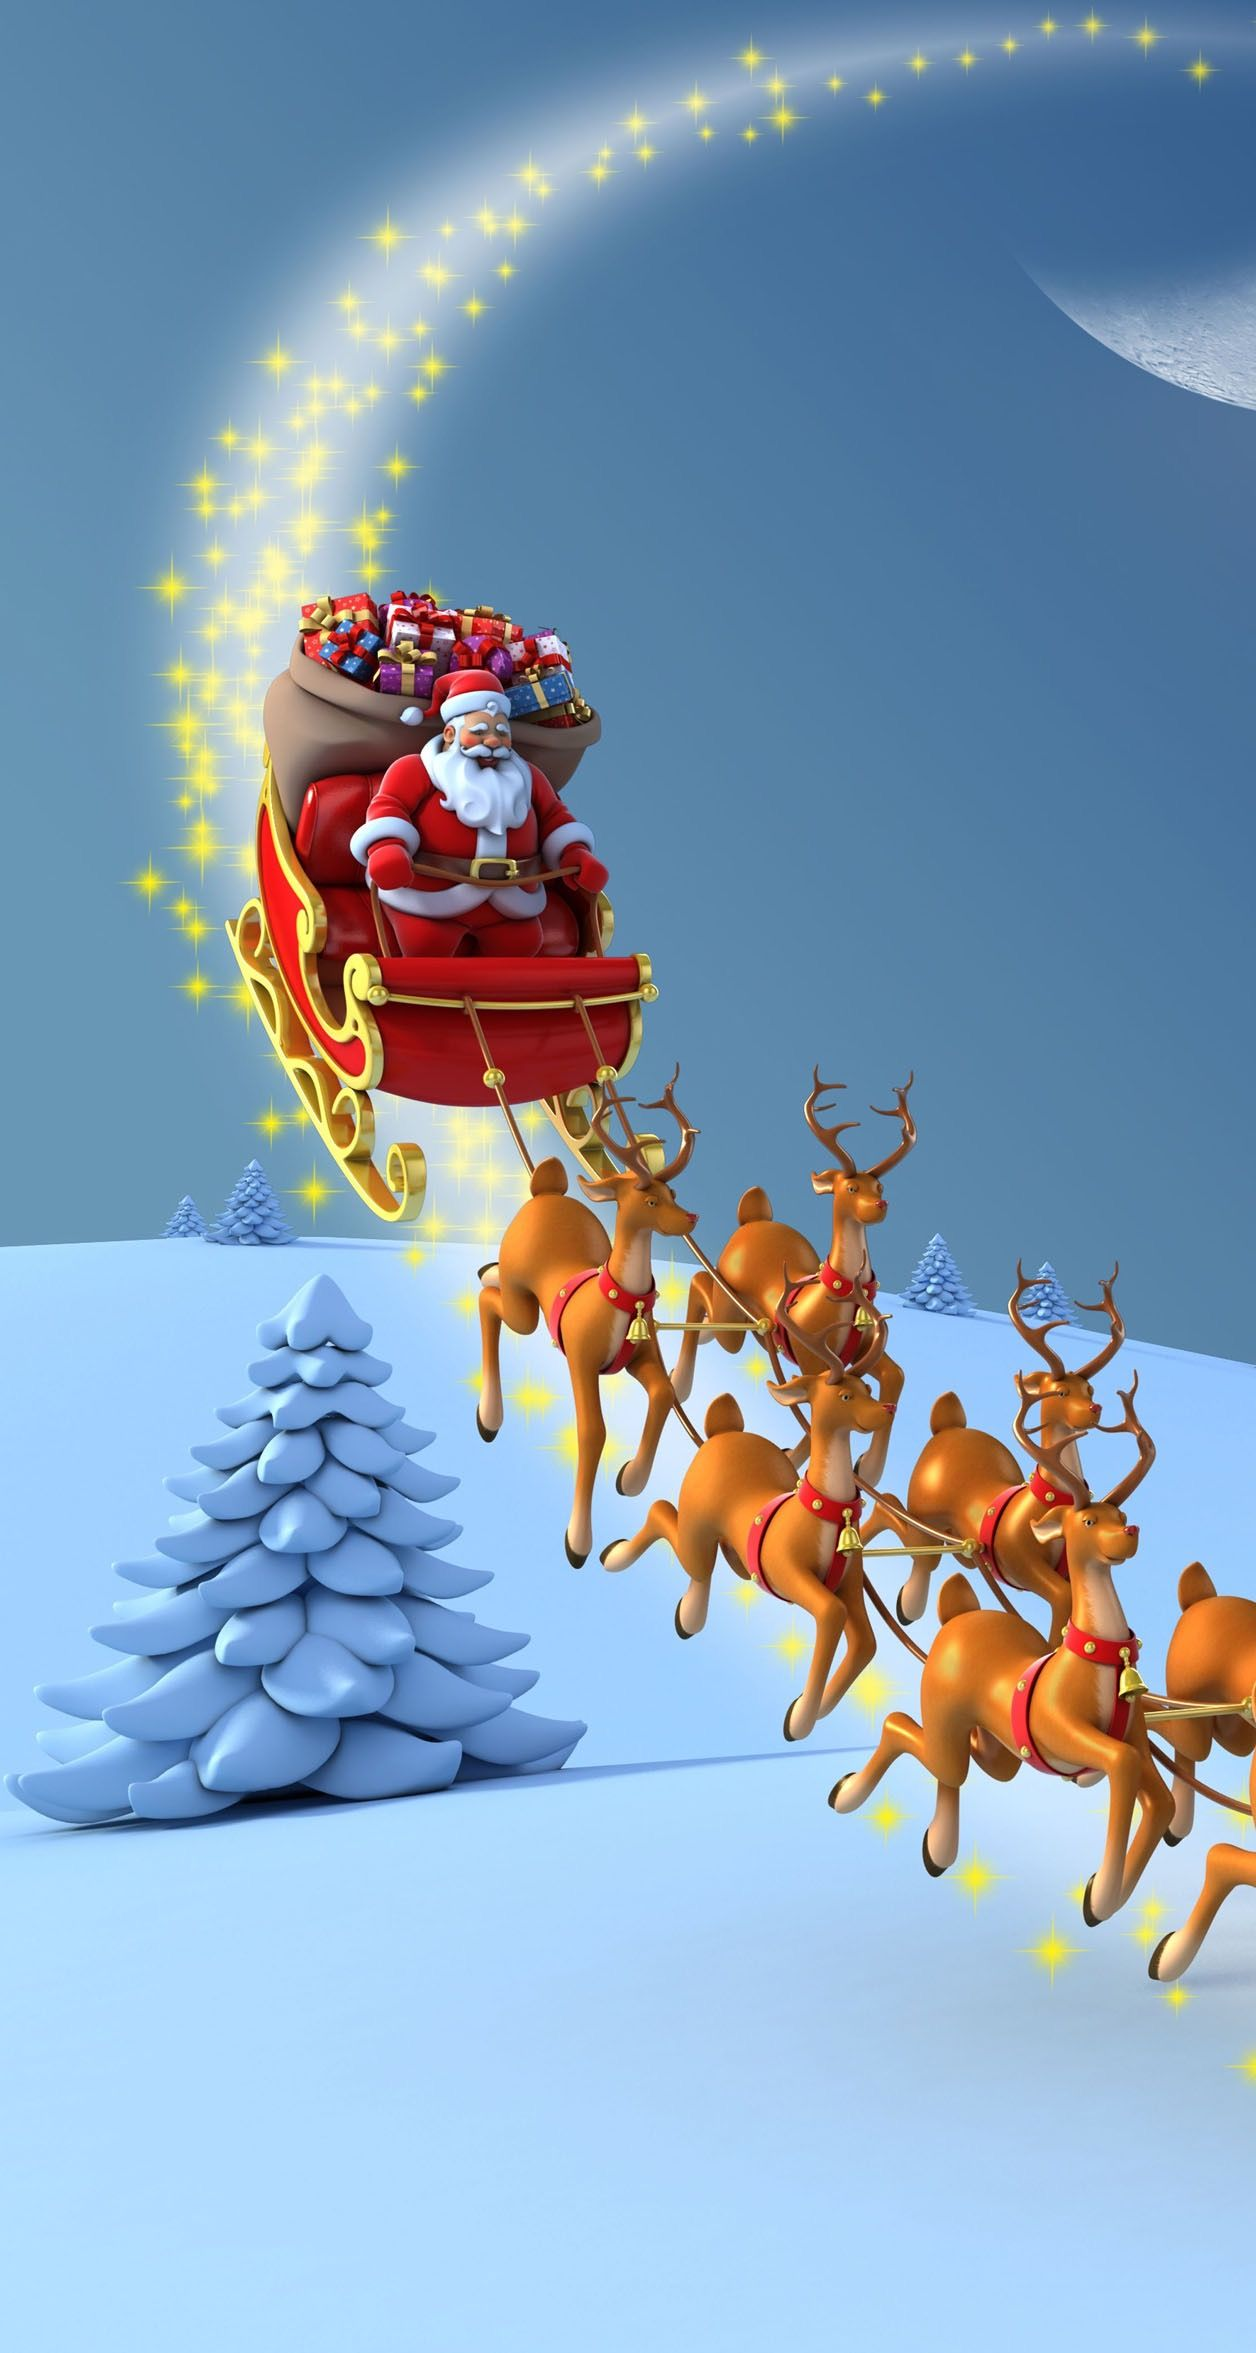 Santa on Christmas Eve Christmas Pinterest